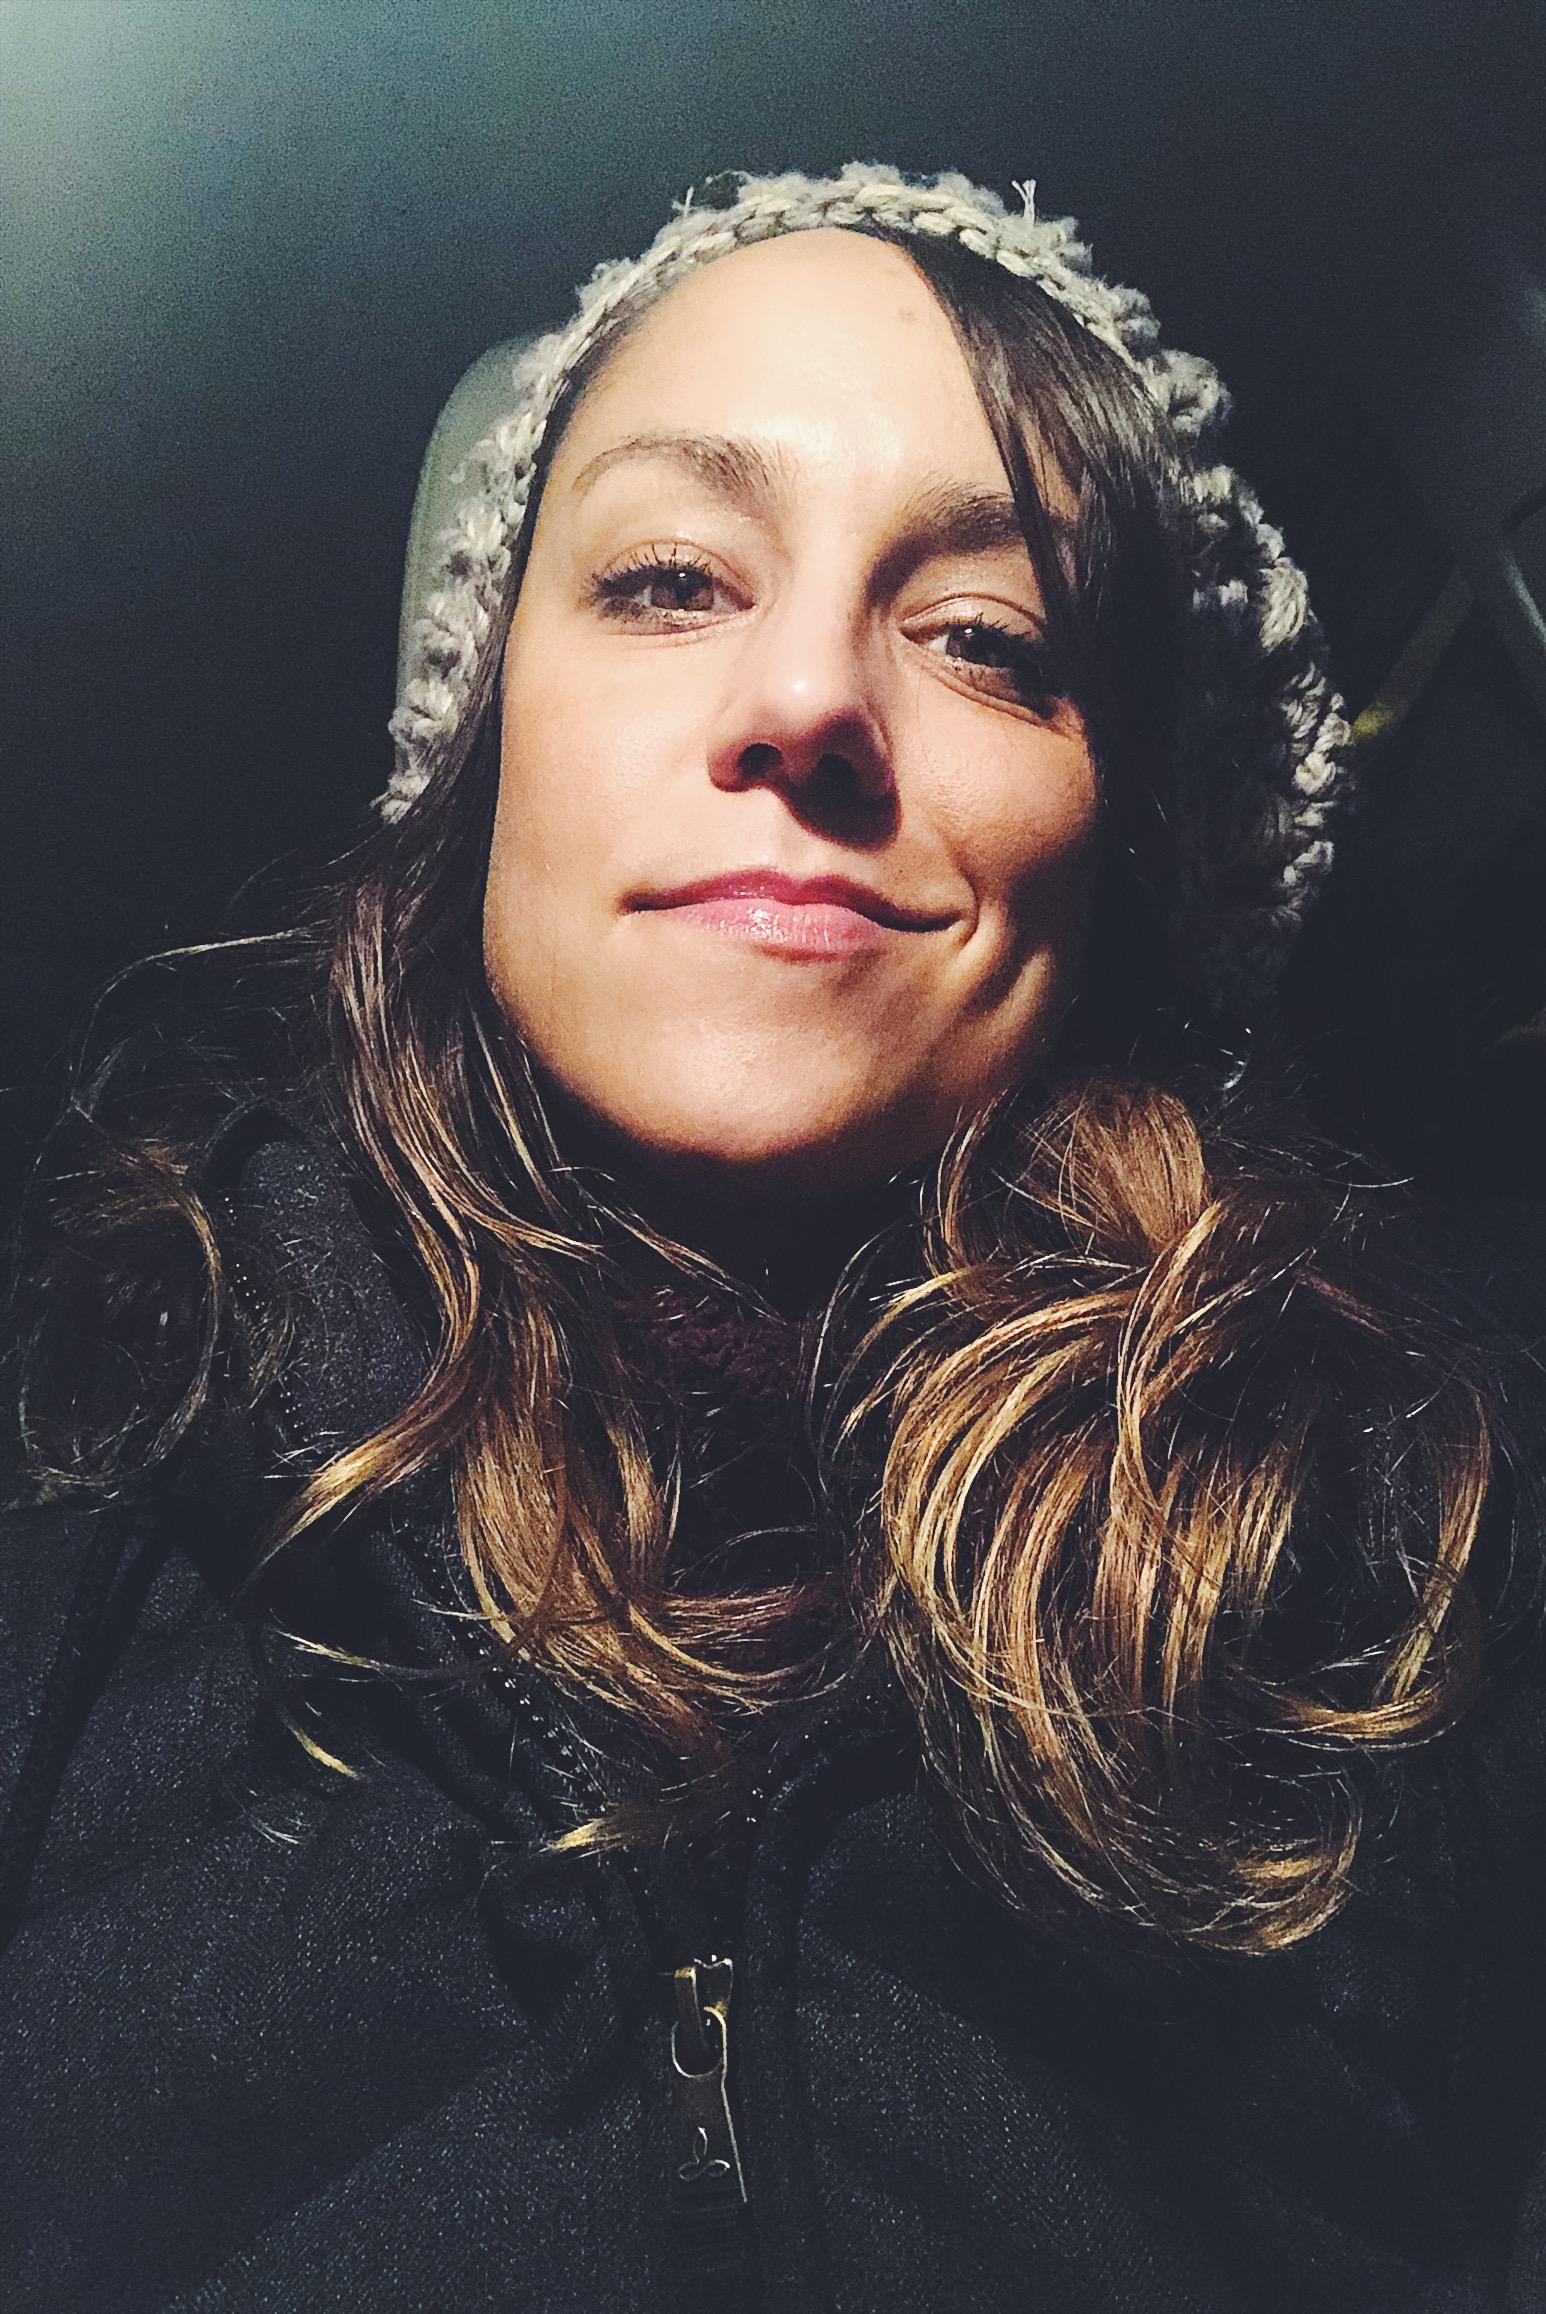 Rochelle Bilow - Human being ❤️